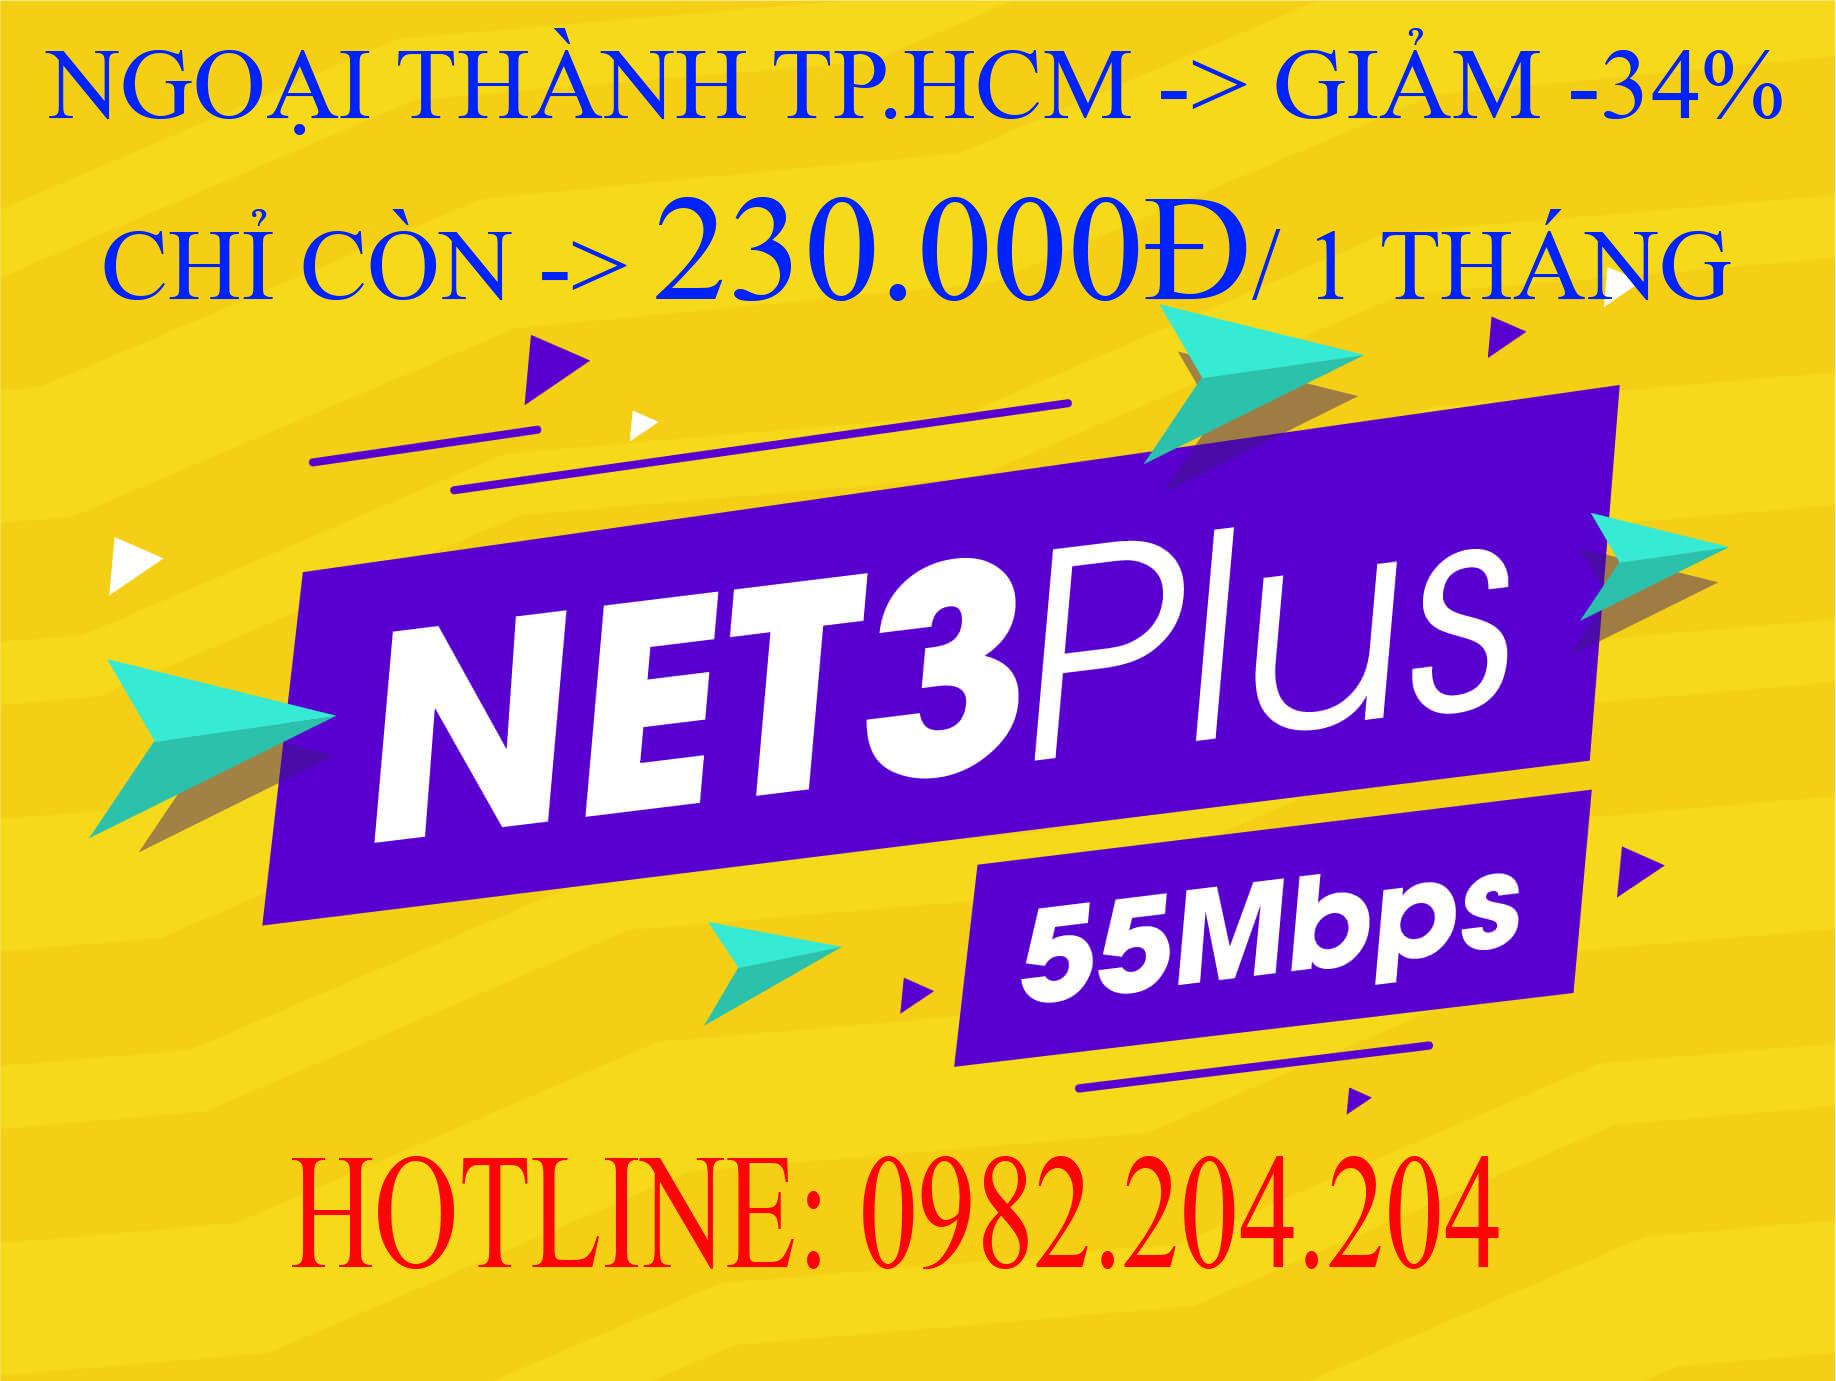 Lắp Wifi Giá Rẻ TPHCM Gói Net 3 plus Viettel 55 Mbps